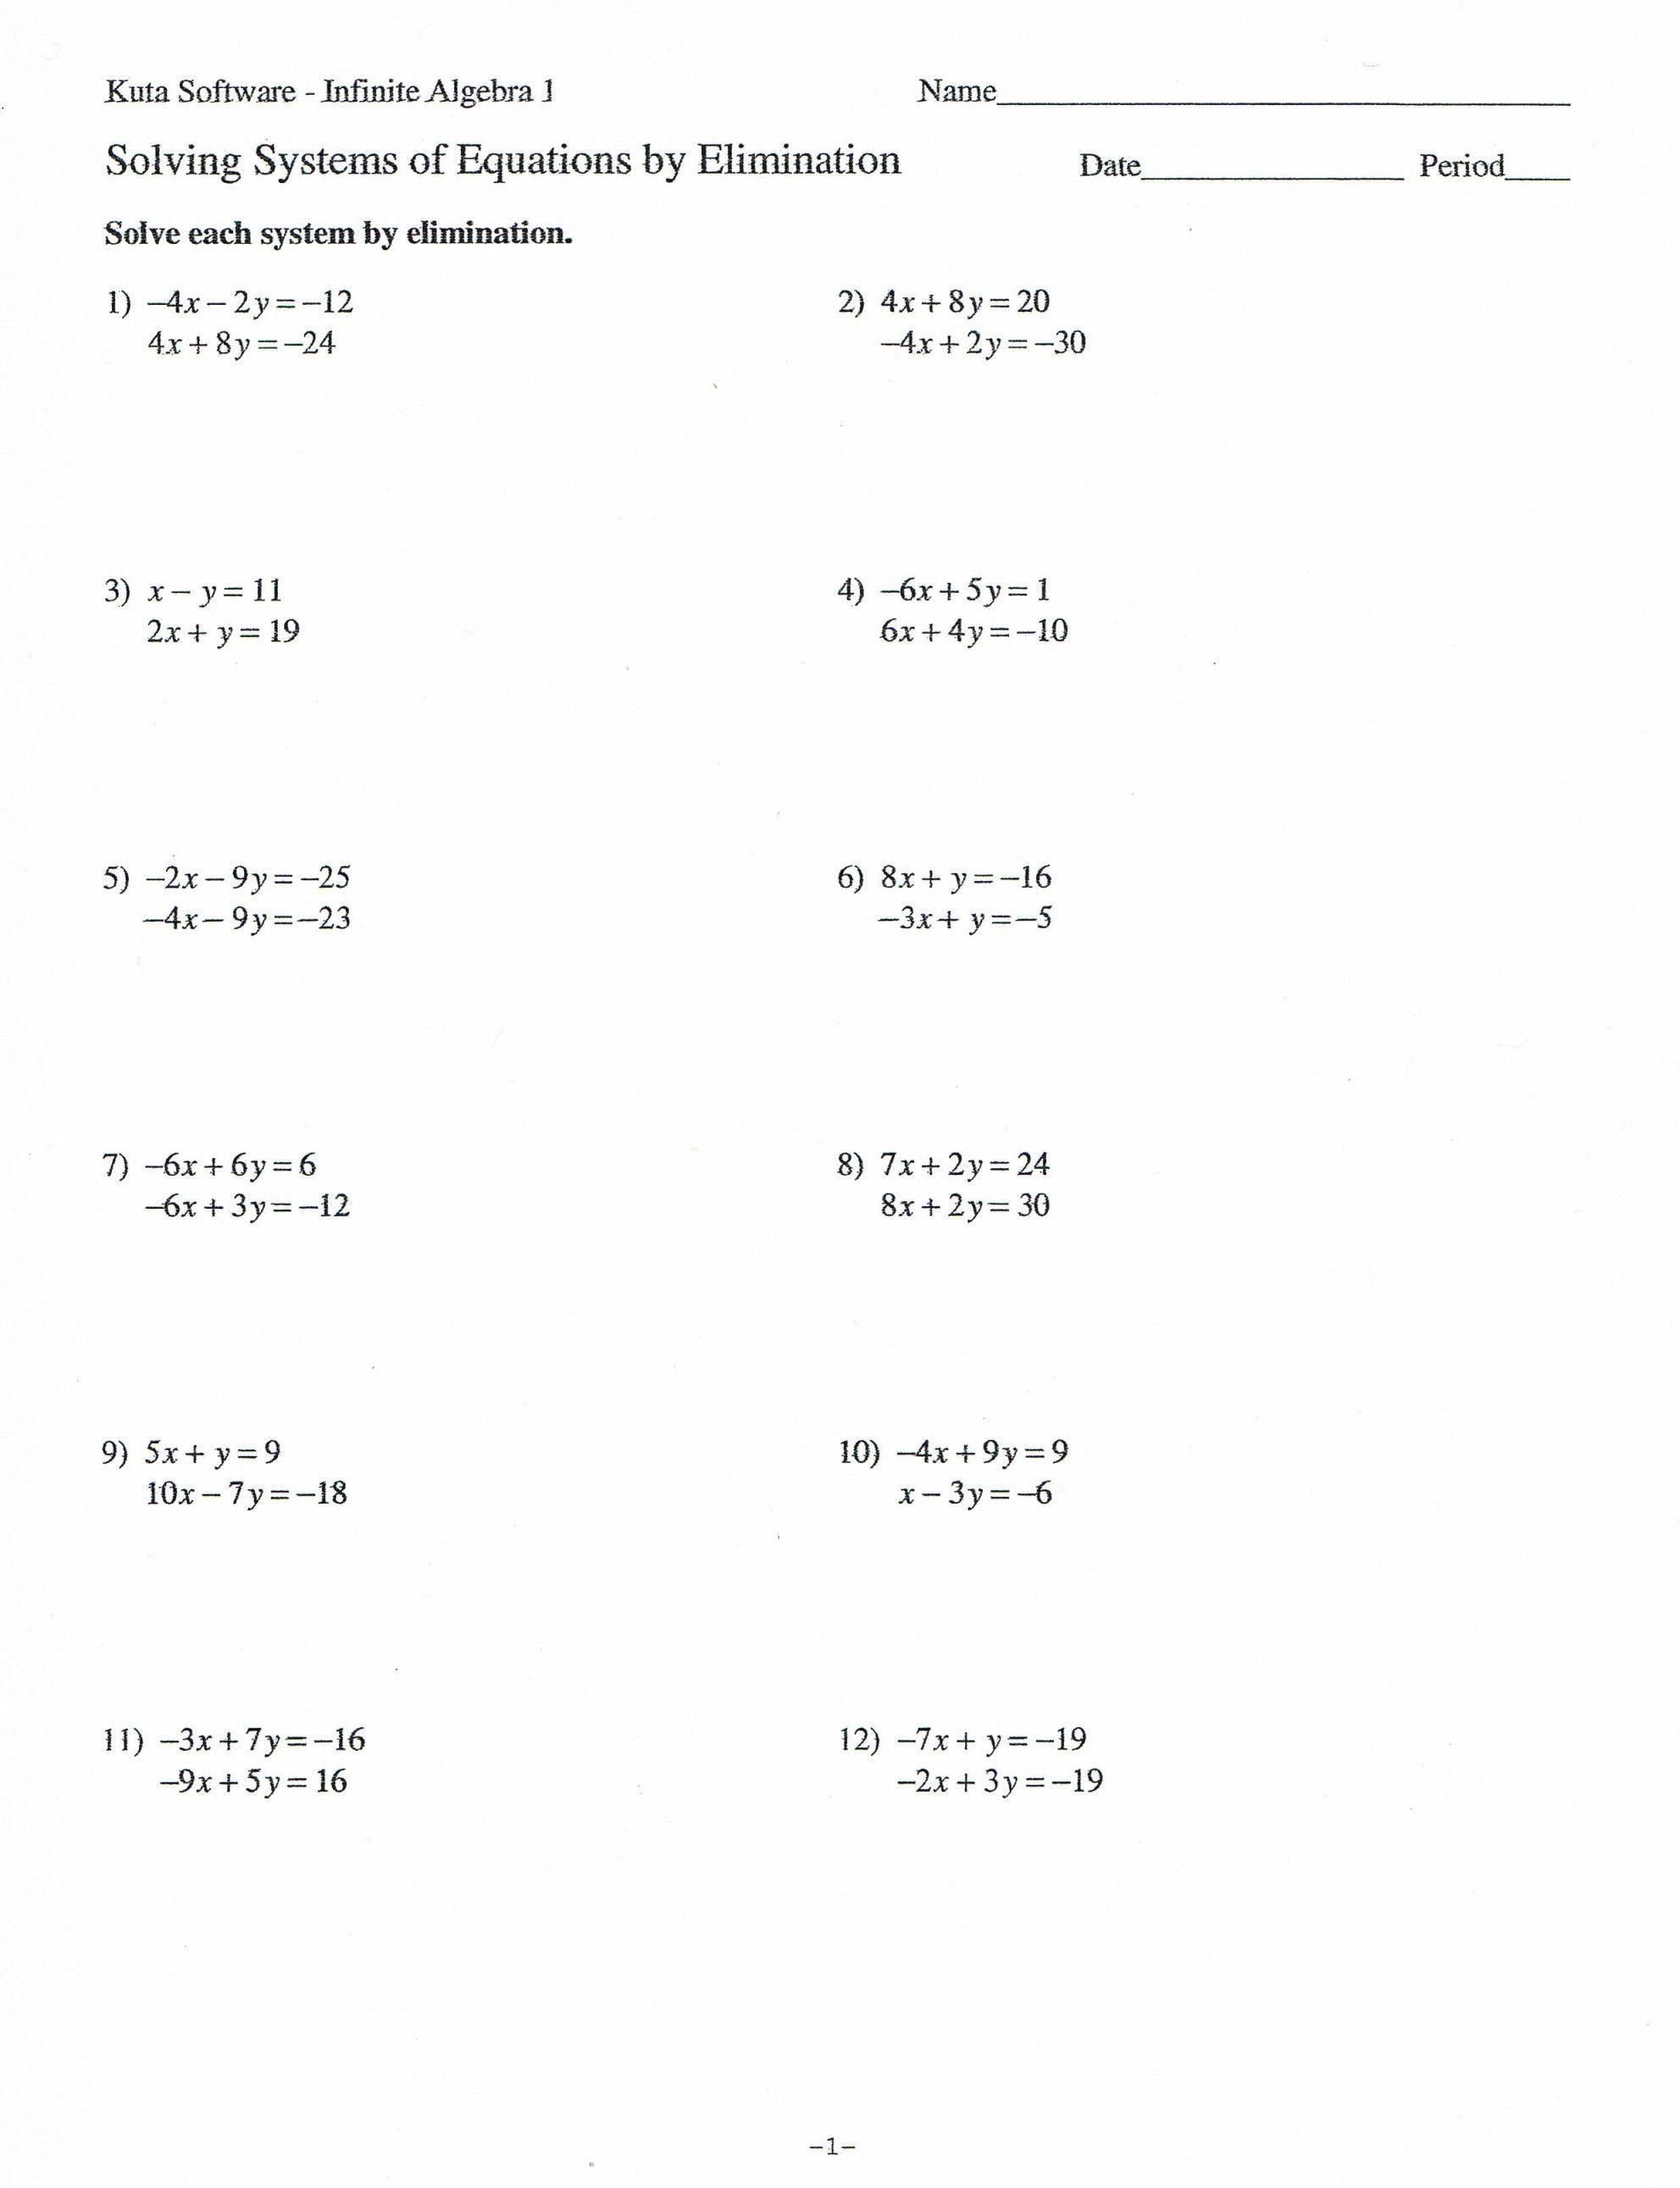 Distributive Property Worksheet 6th Grade Distributive Property Worksheets 6th Grade